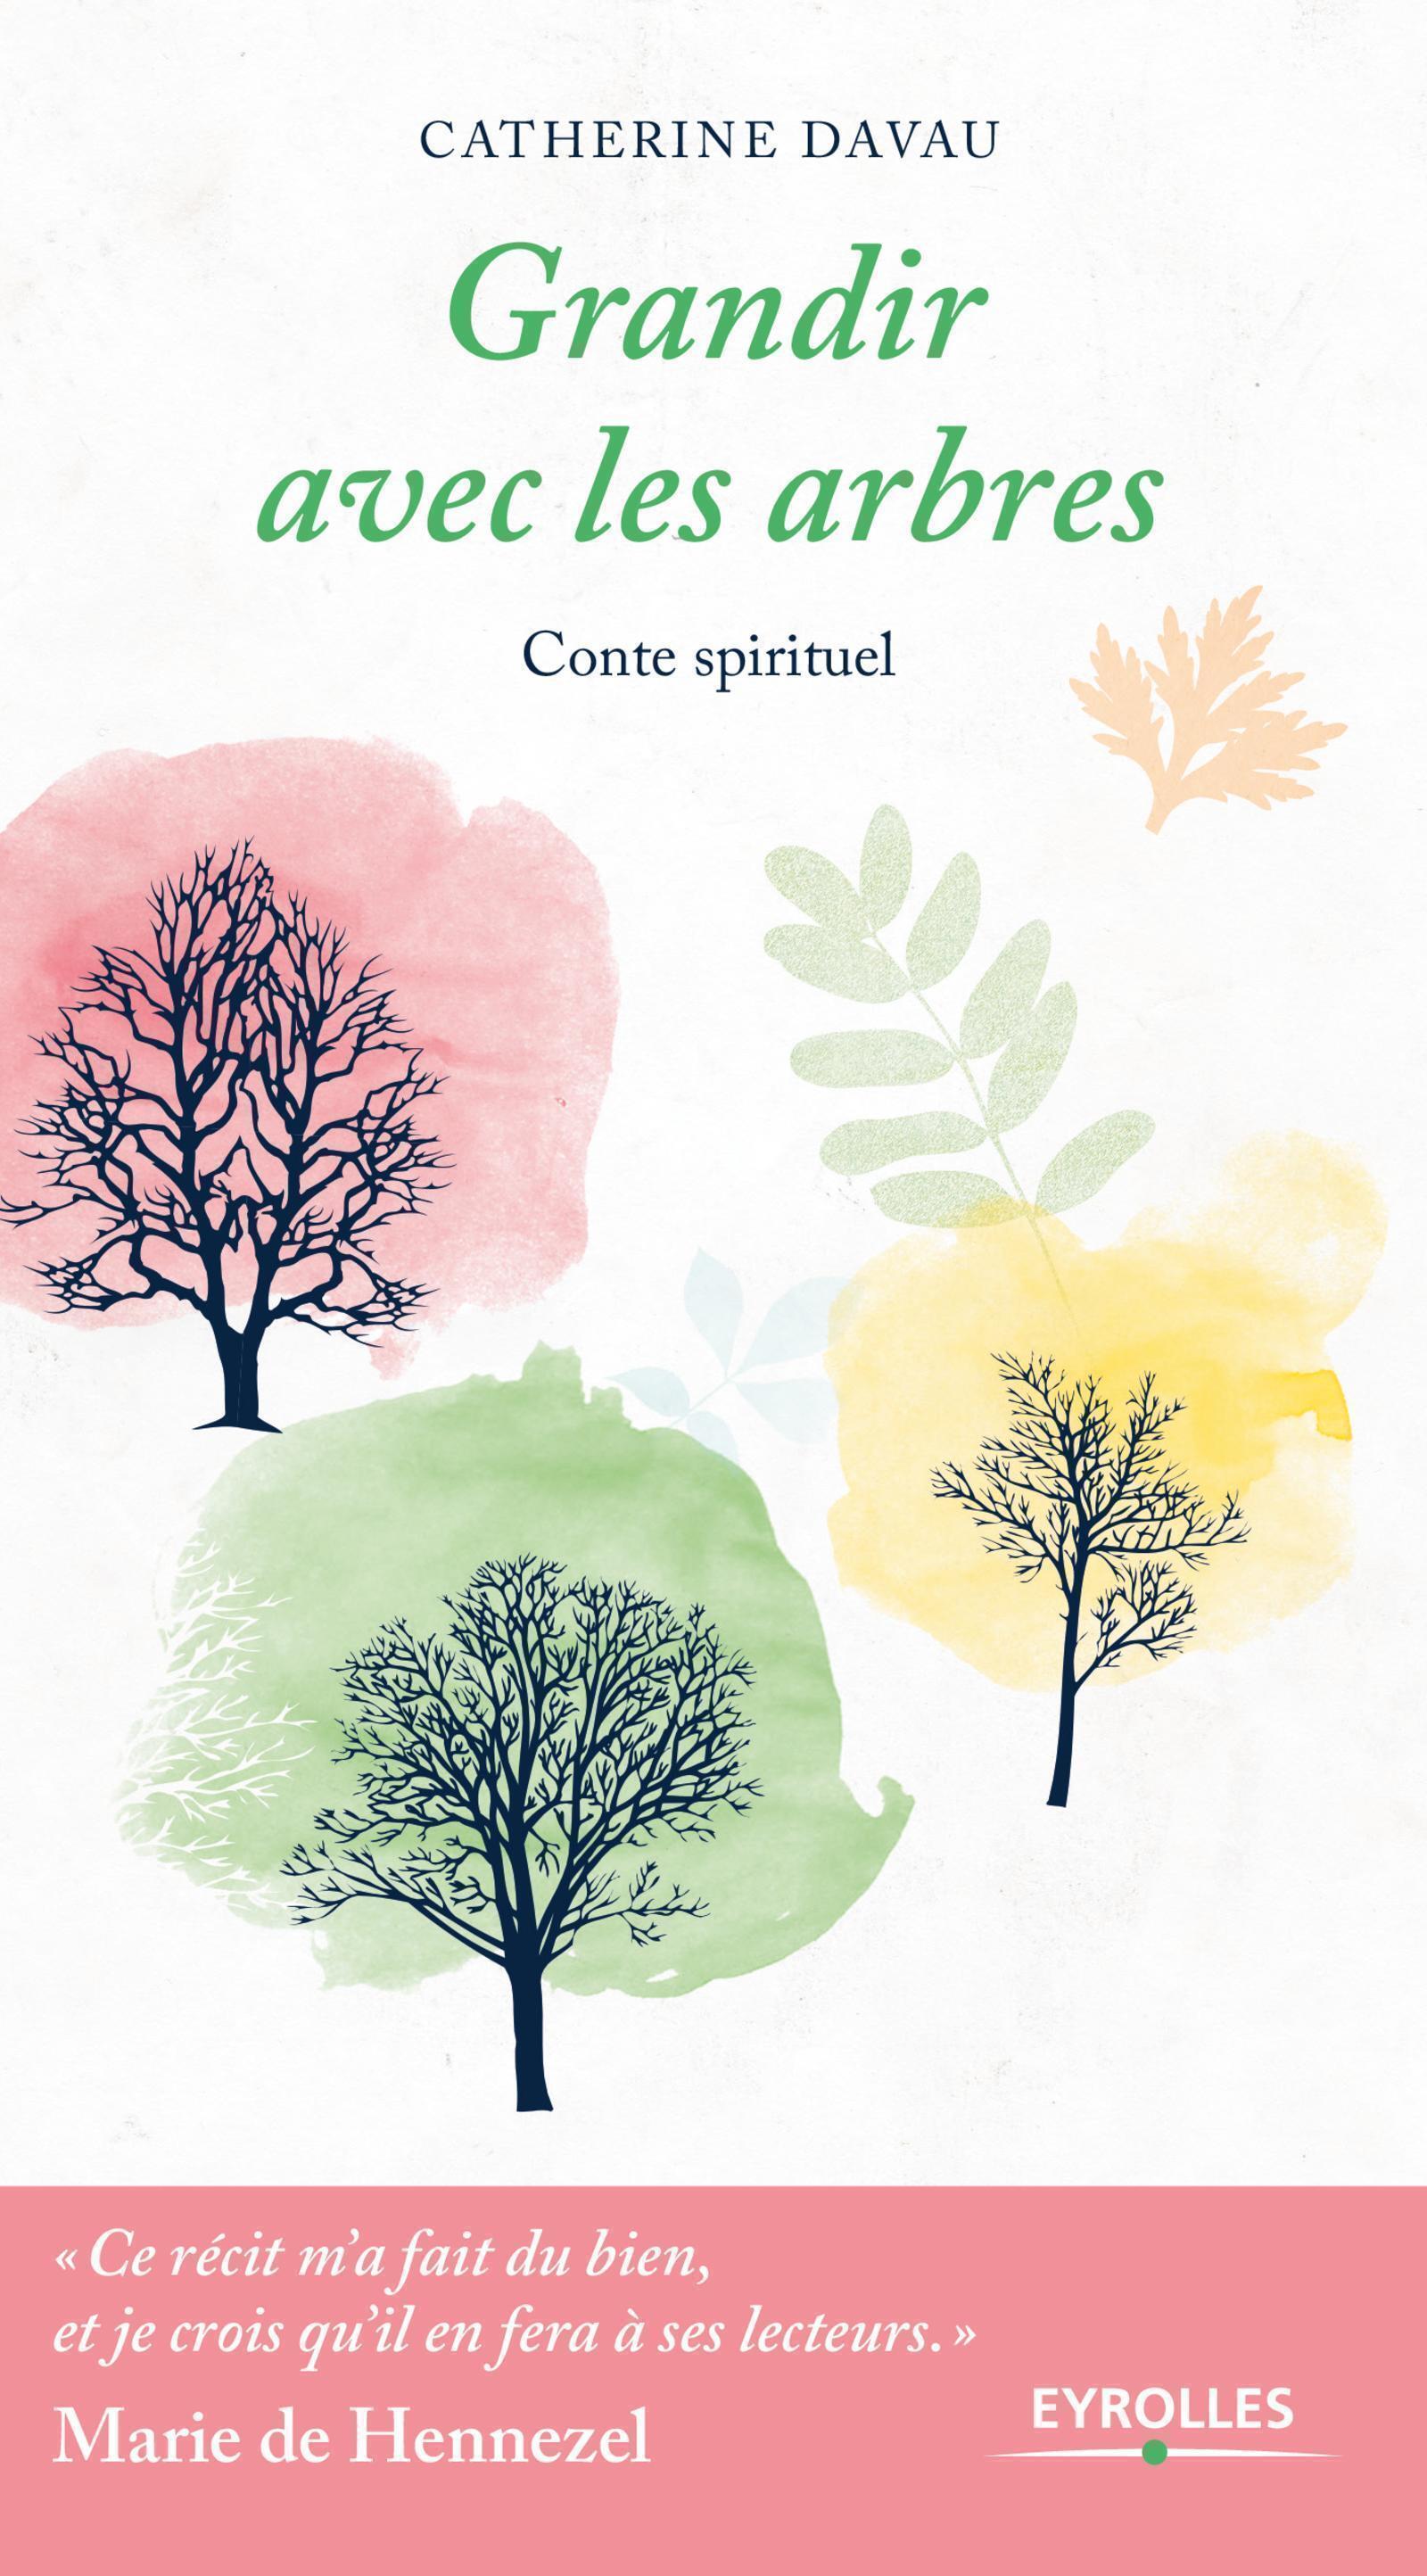 GRANDIR AVEC LES ARBRES - CONTE SPIRITUEL